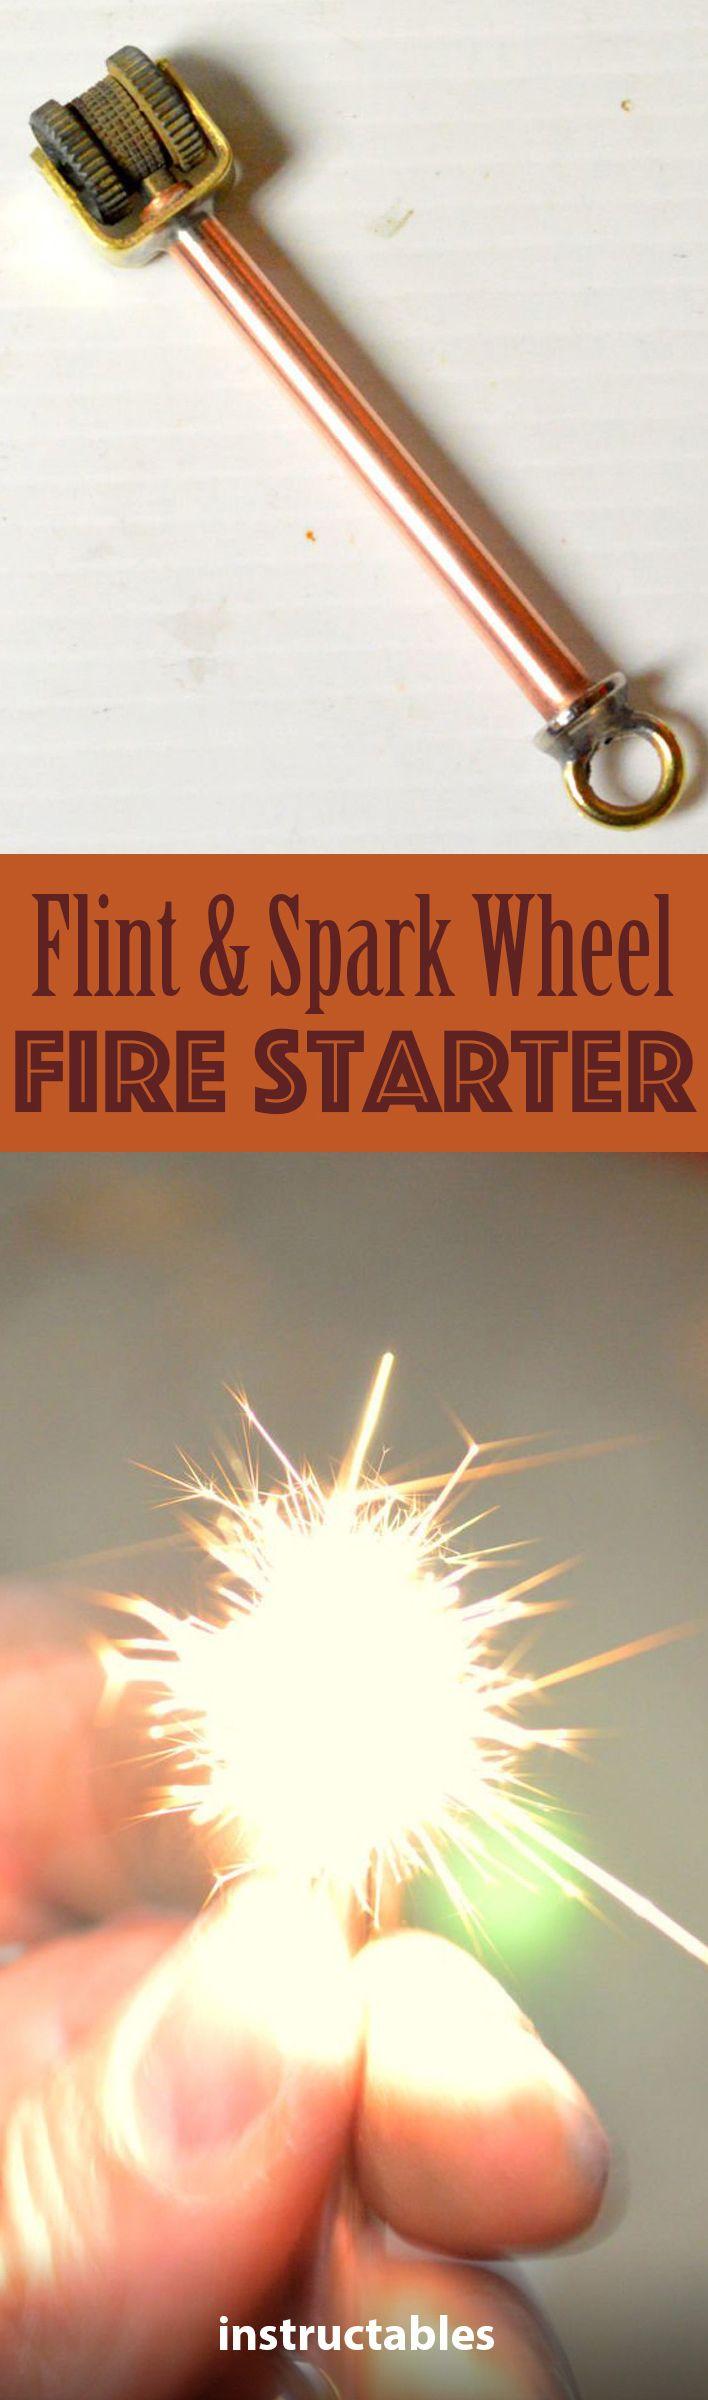 Photo of Flint and Spark Wheel Fire Starter